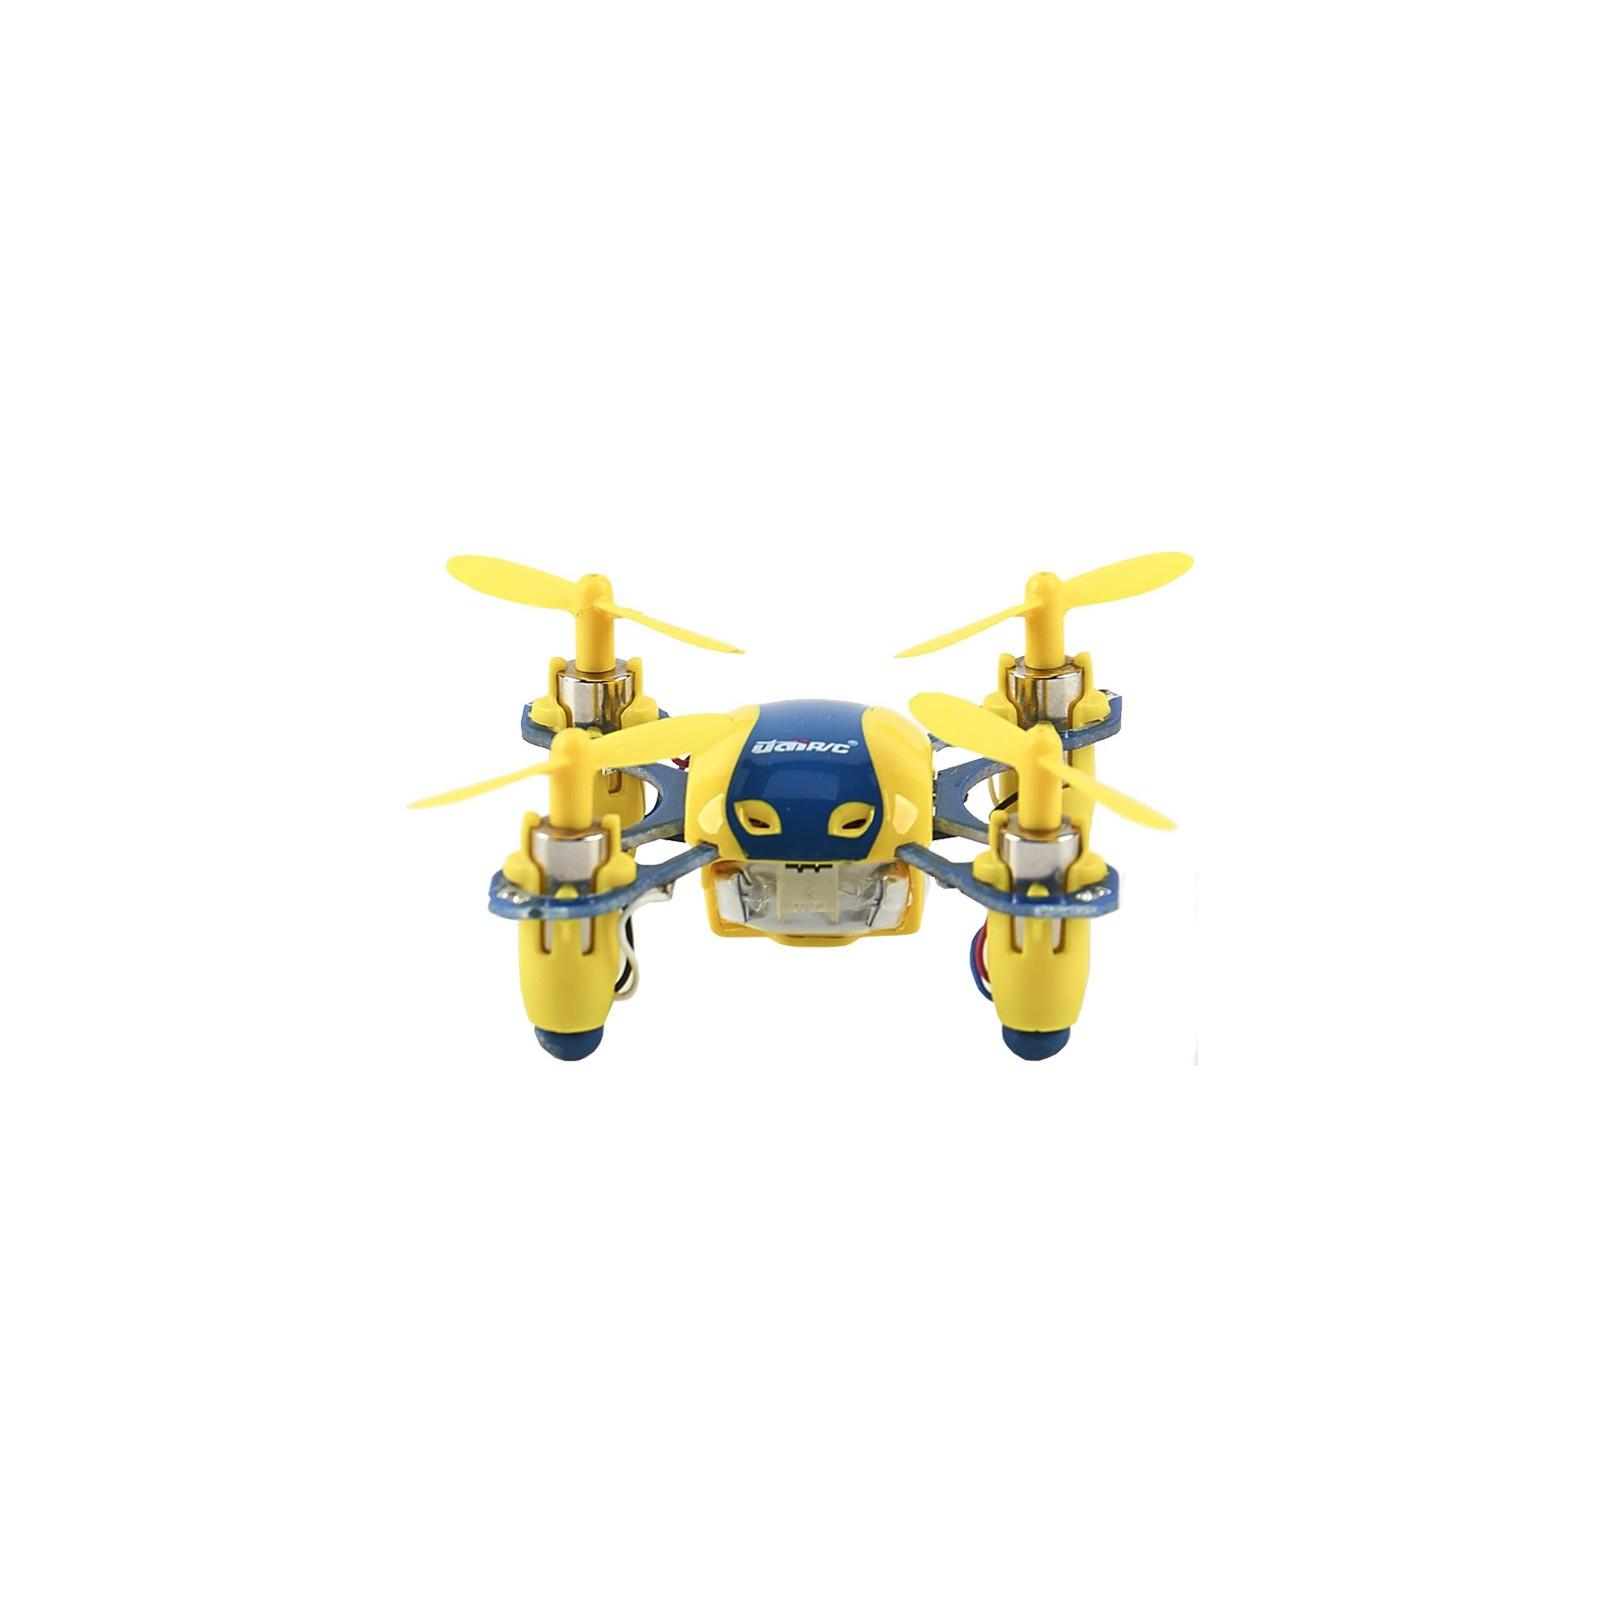 Квадрокоптер UDIRC 2,4 GHz 40 мм мини 3.7V (U840 Yellow/Blue) изображение 3